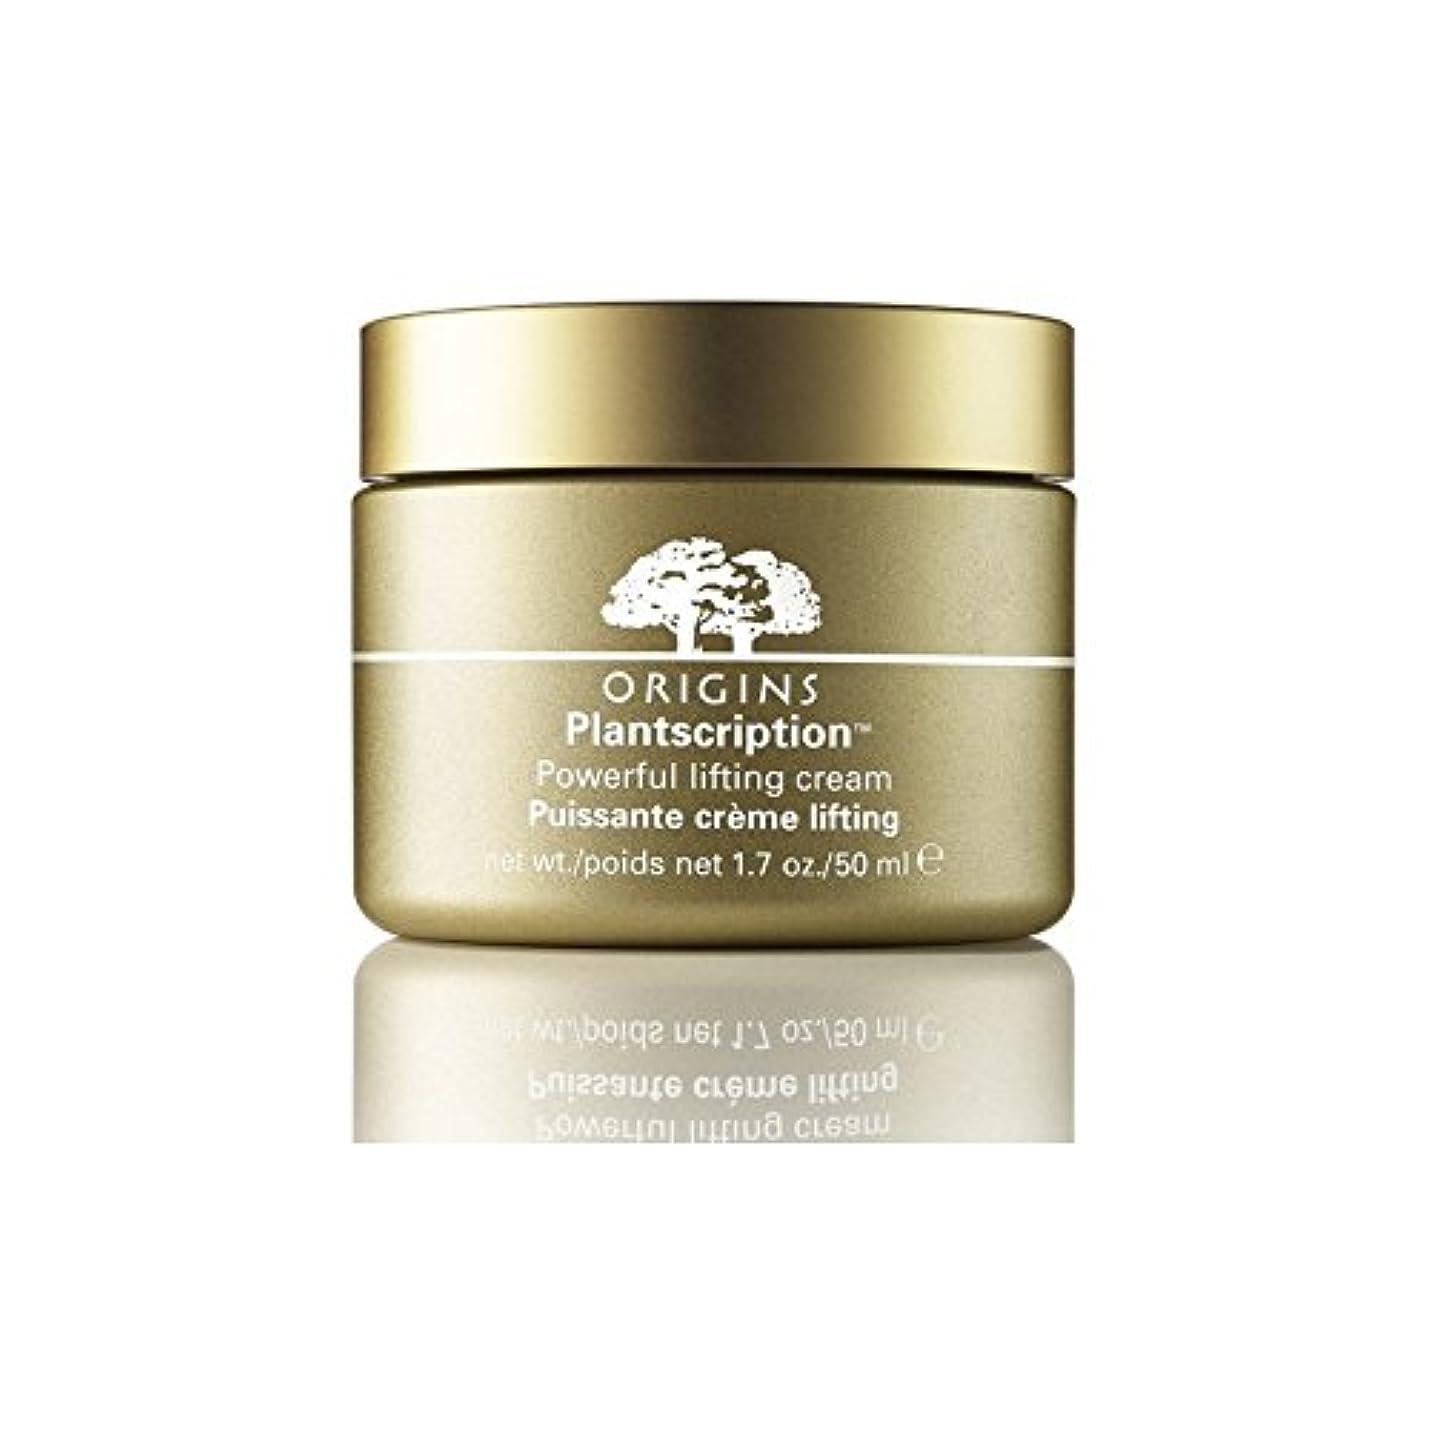 Origins Plantscription Powerful Lifting Cream 50ml (Pack of 6) - 起源強力なリフティングクリーム50 x6 [並行輸入品]